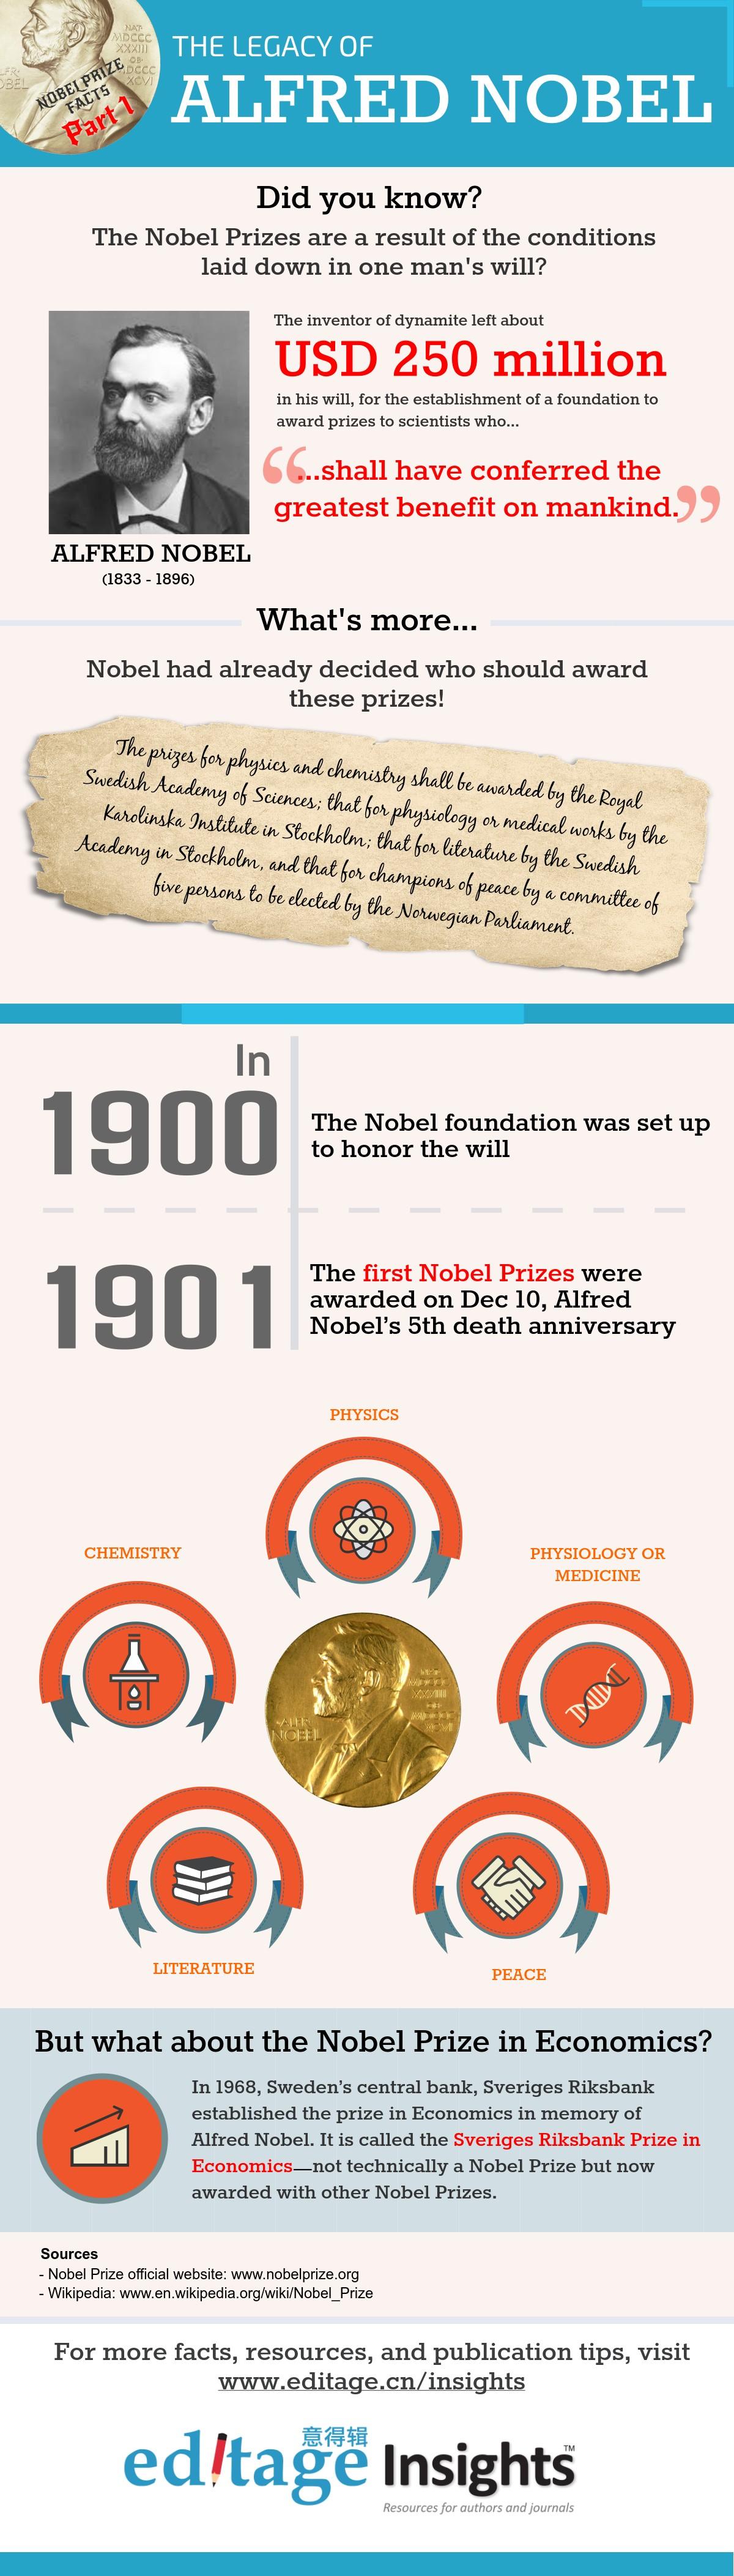 Alfred Nobel 的遗产和诺奖起始_意得辑专家视点